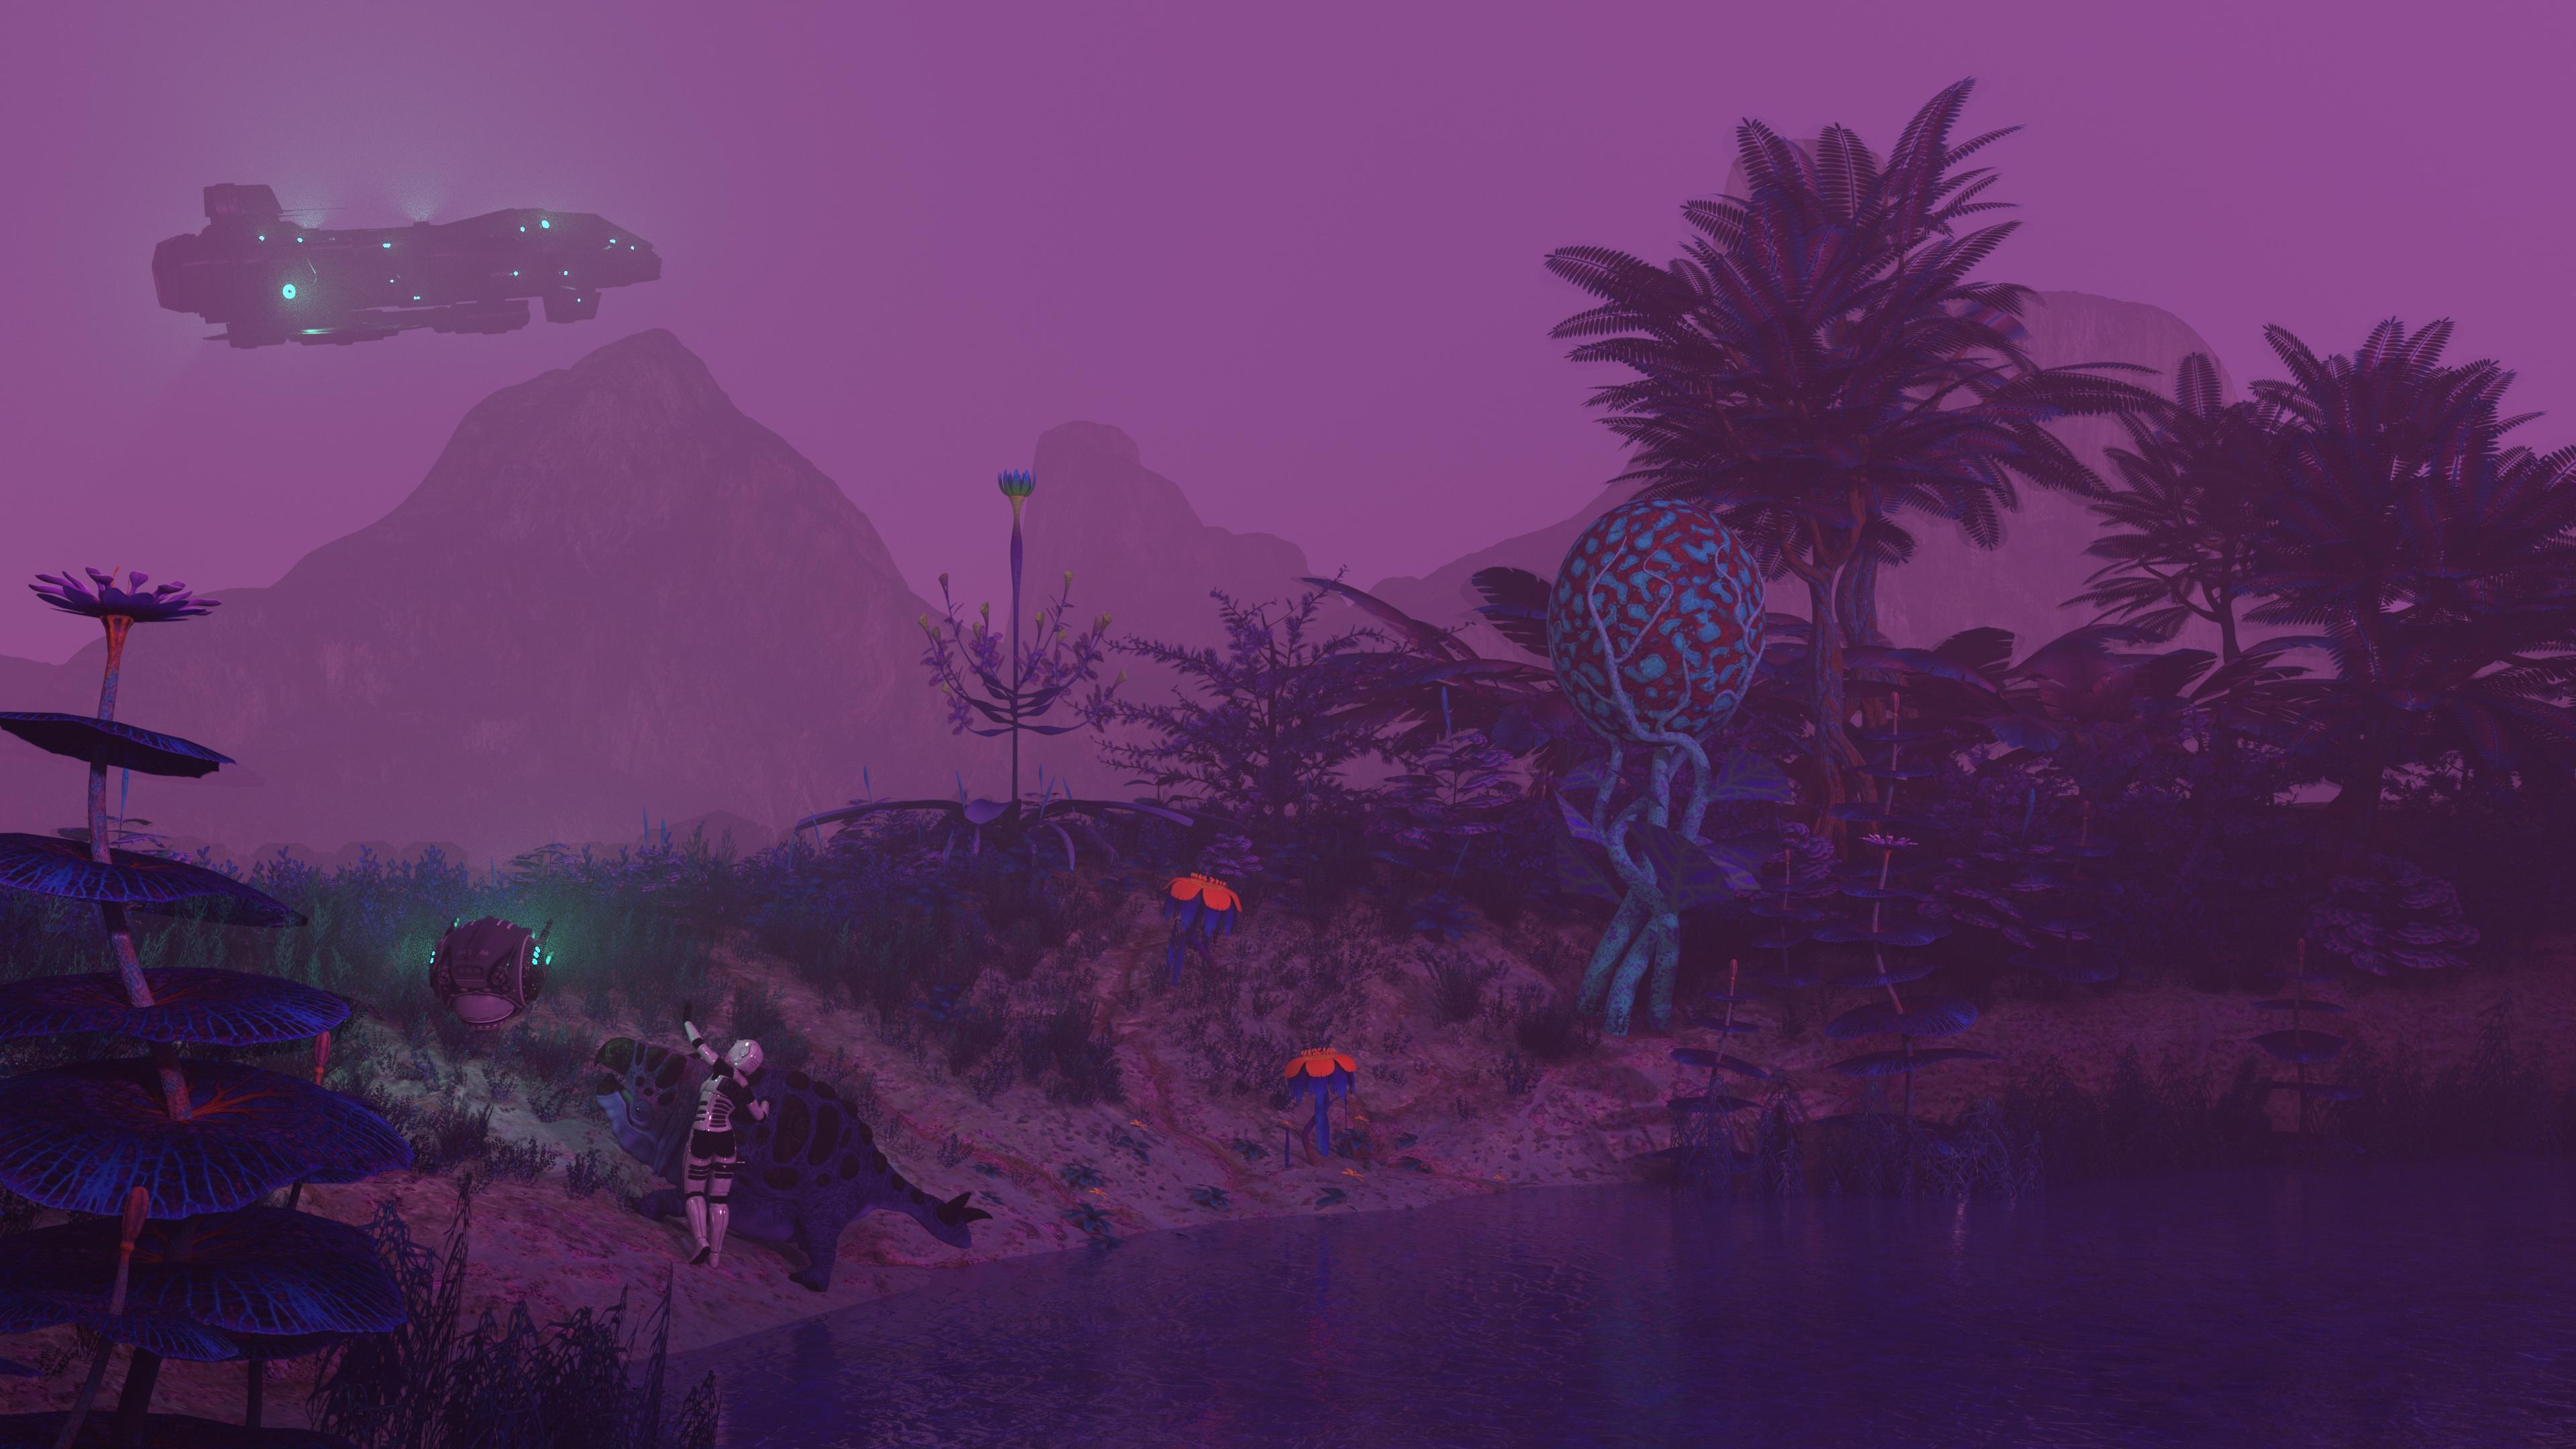 A trip to planet Glise